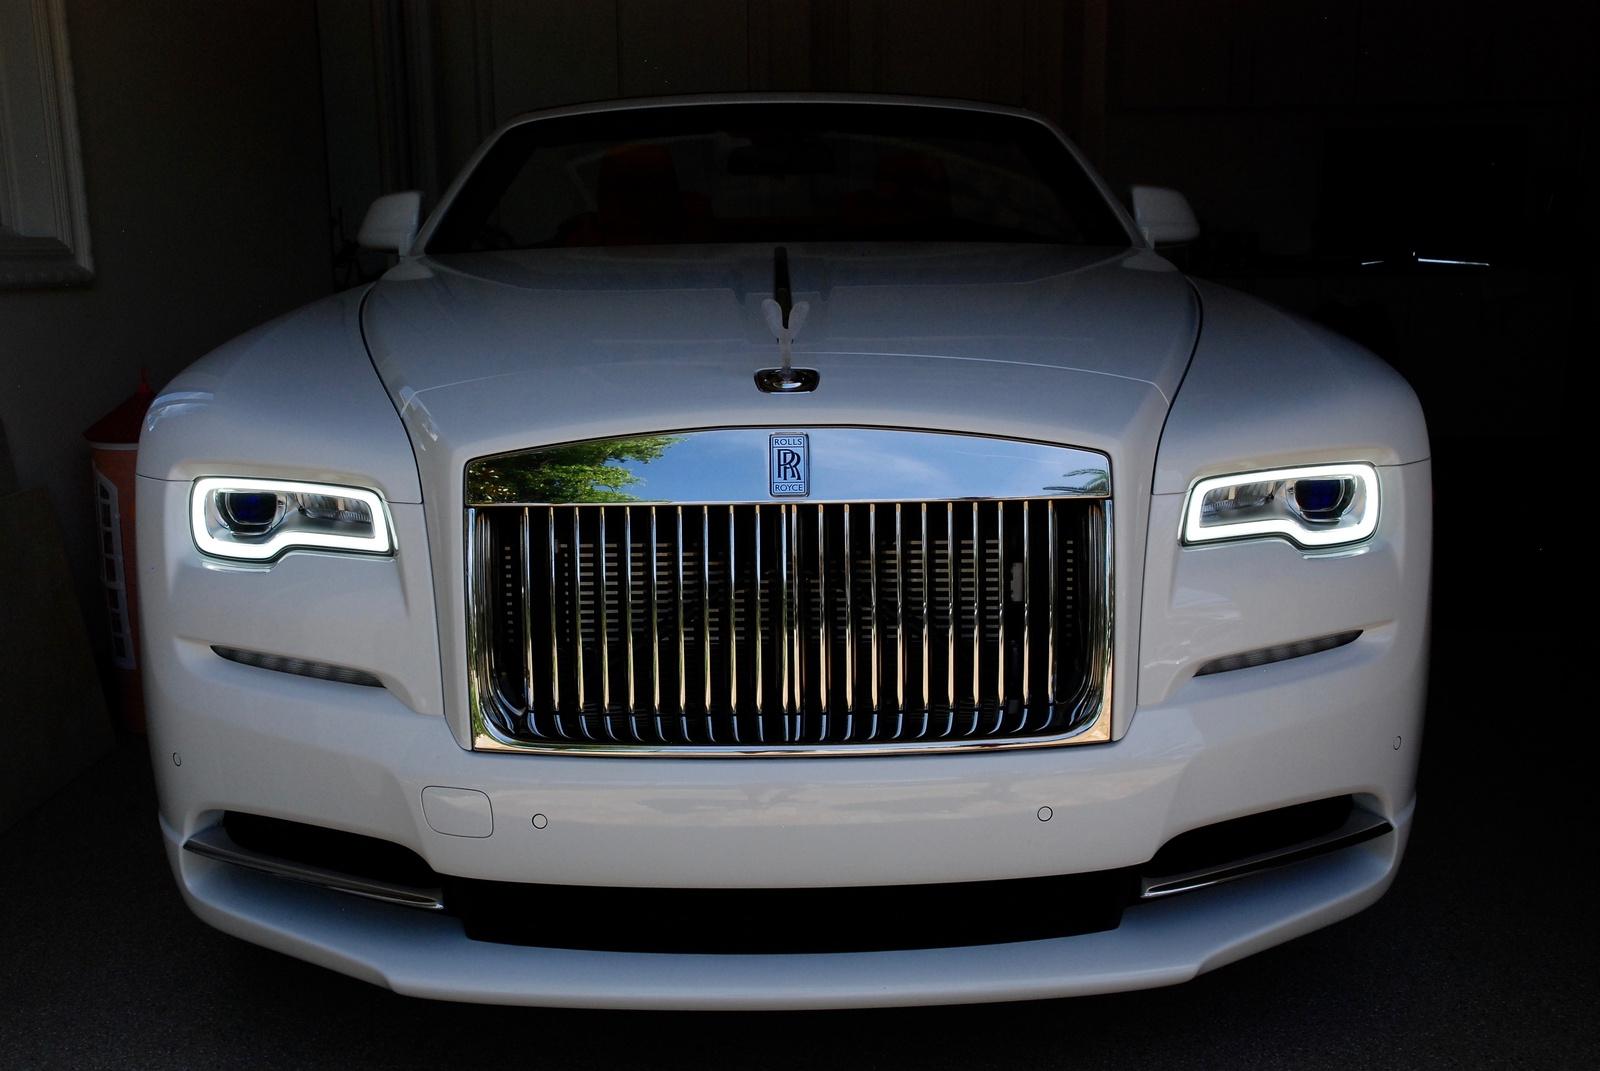 2017 2018 Rolls Royce Dawn For Sale In Saint Louis Mo